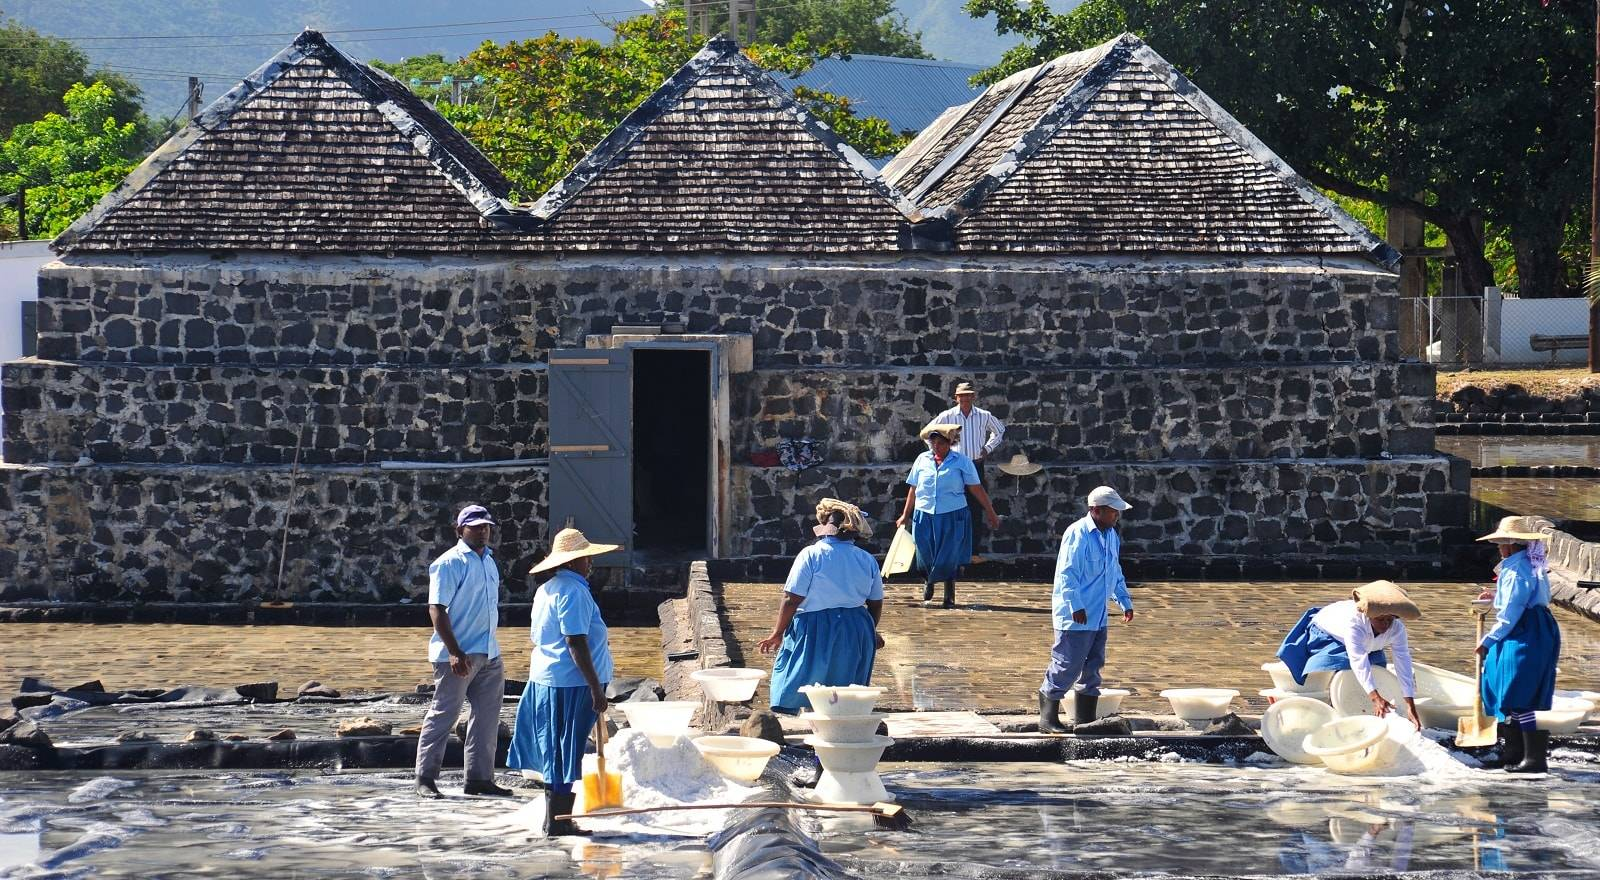 The Tamarin Salt Pans - Oldest salt farm in Mauritius